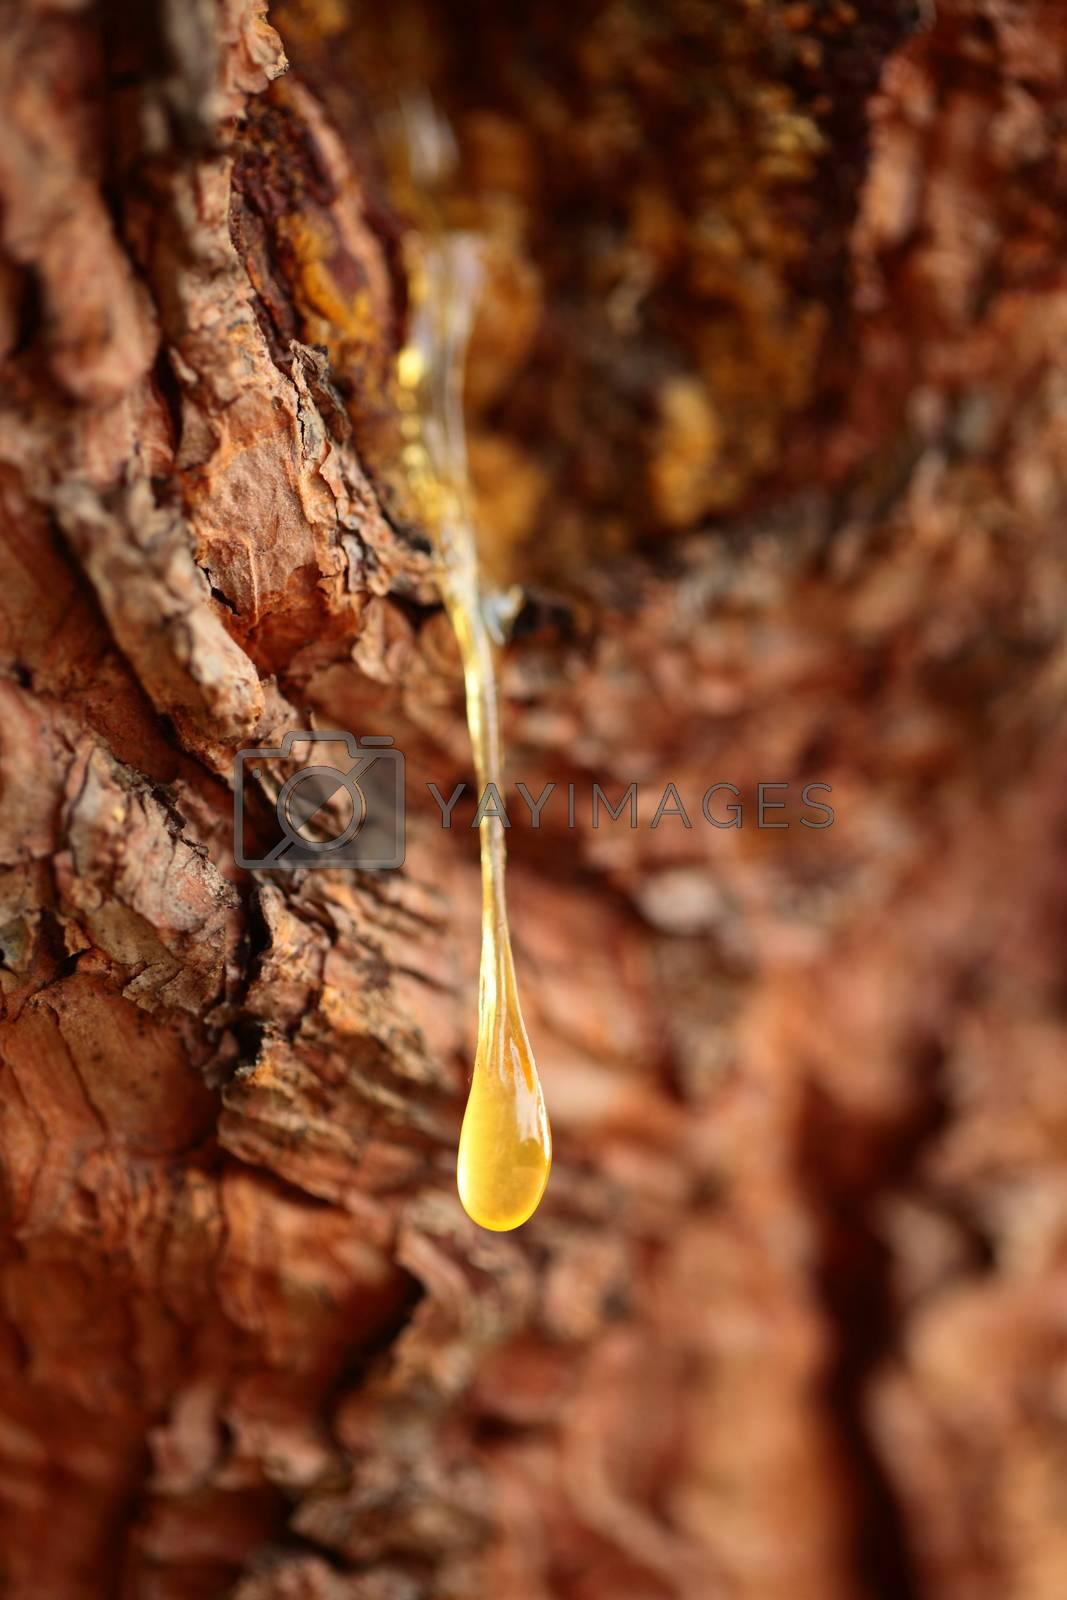 Close up of a drop of pine resin